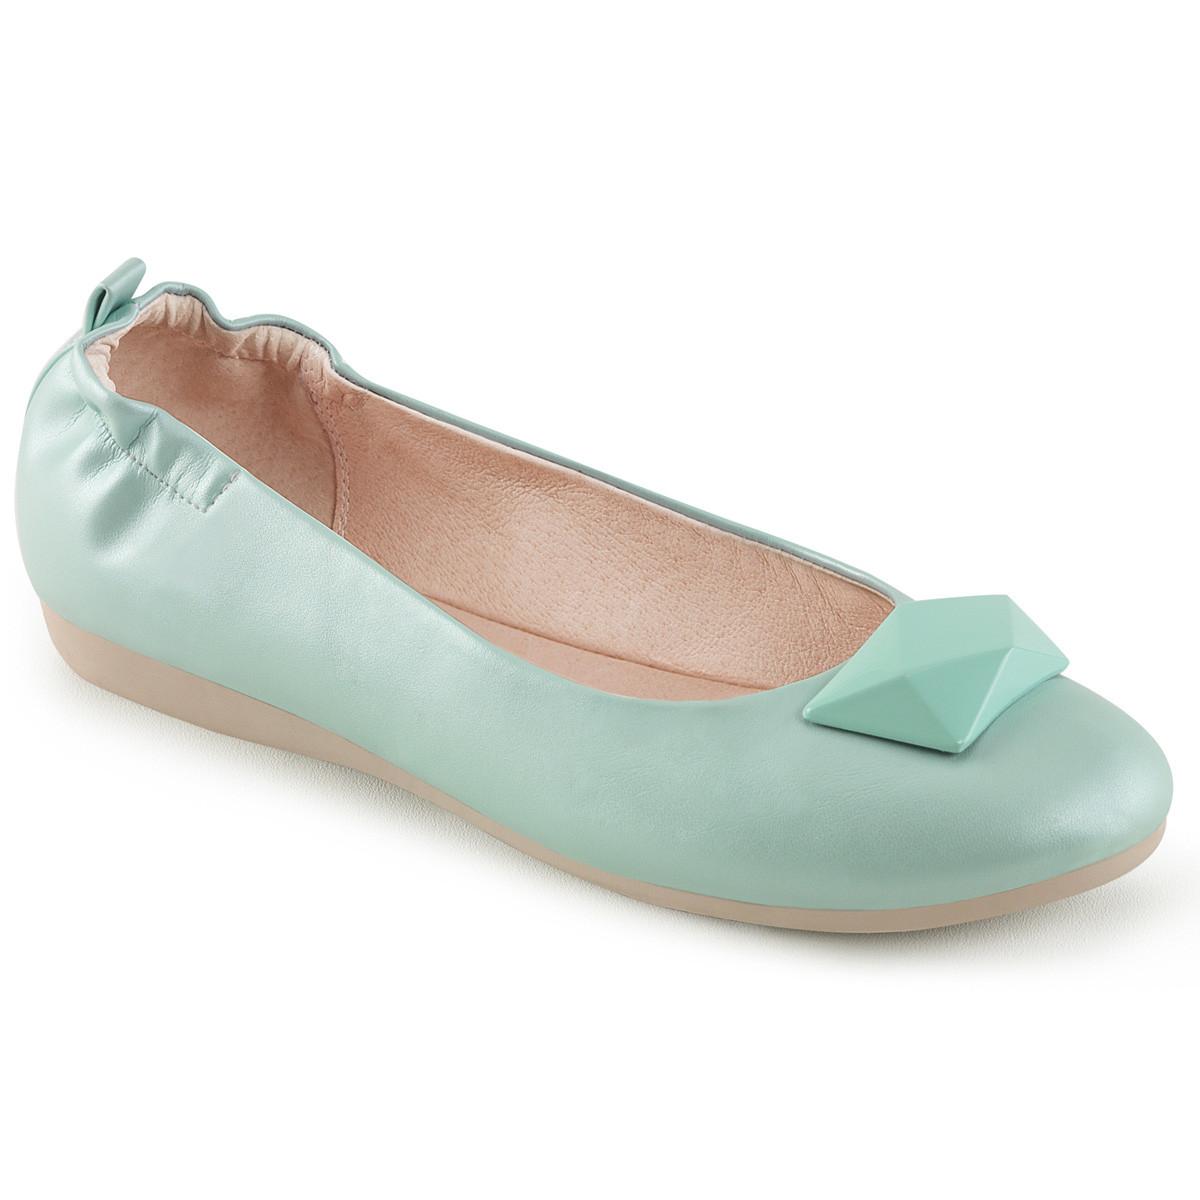 Ballerinas - OLIVE 08 ° Damen Ballerina ° Aqua ° Beige ° Pin Up Couture  - Onlineshop RedSixty